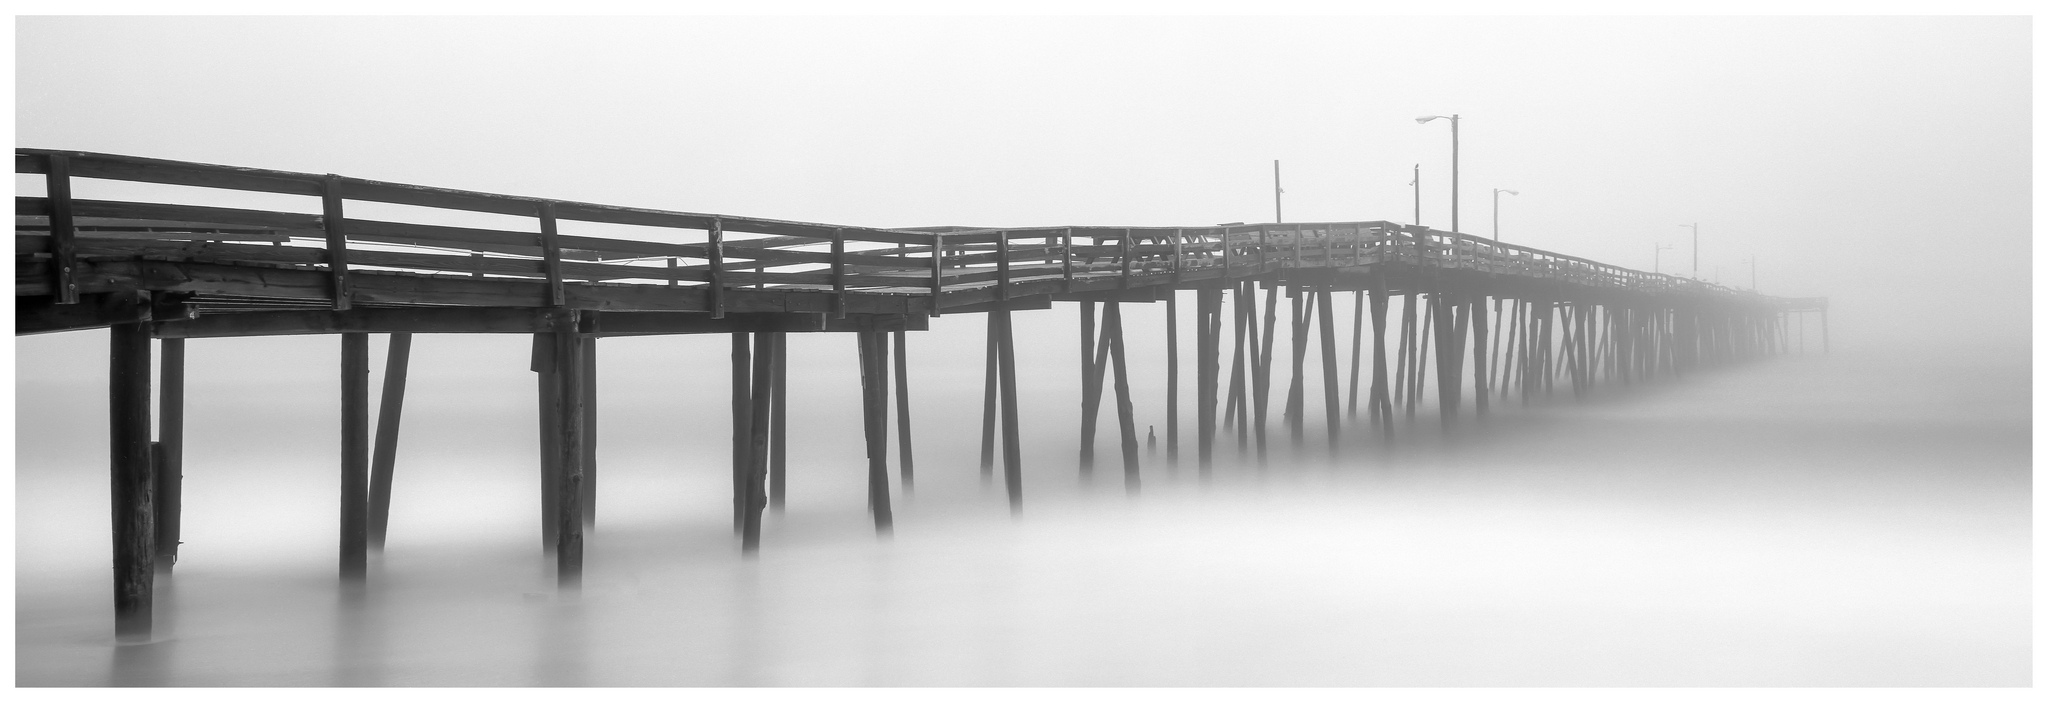 Nags Head Fishing Pier - Fuji GX617 w/105mm lens on Fuji ACROS film, long exposure with tide coming in.